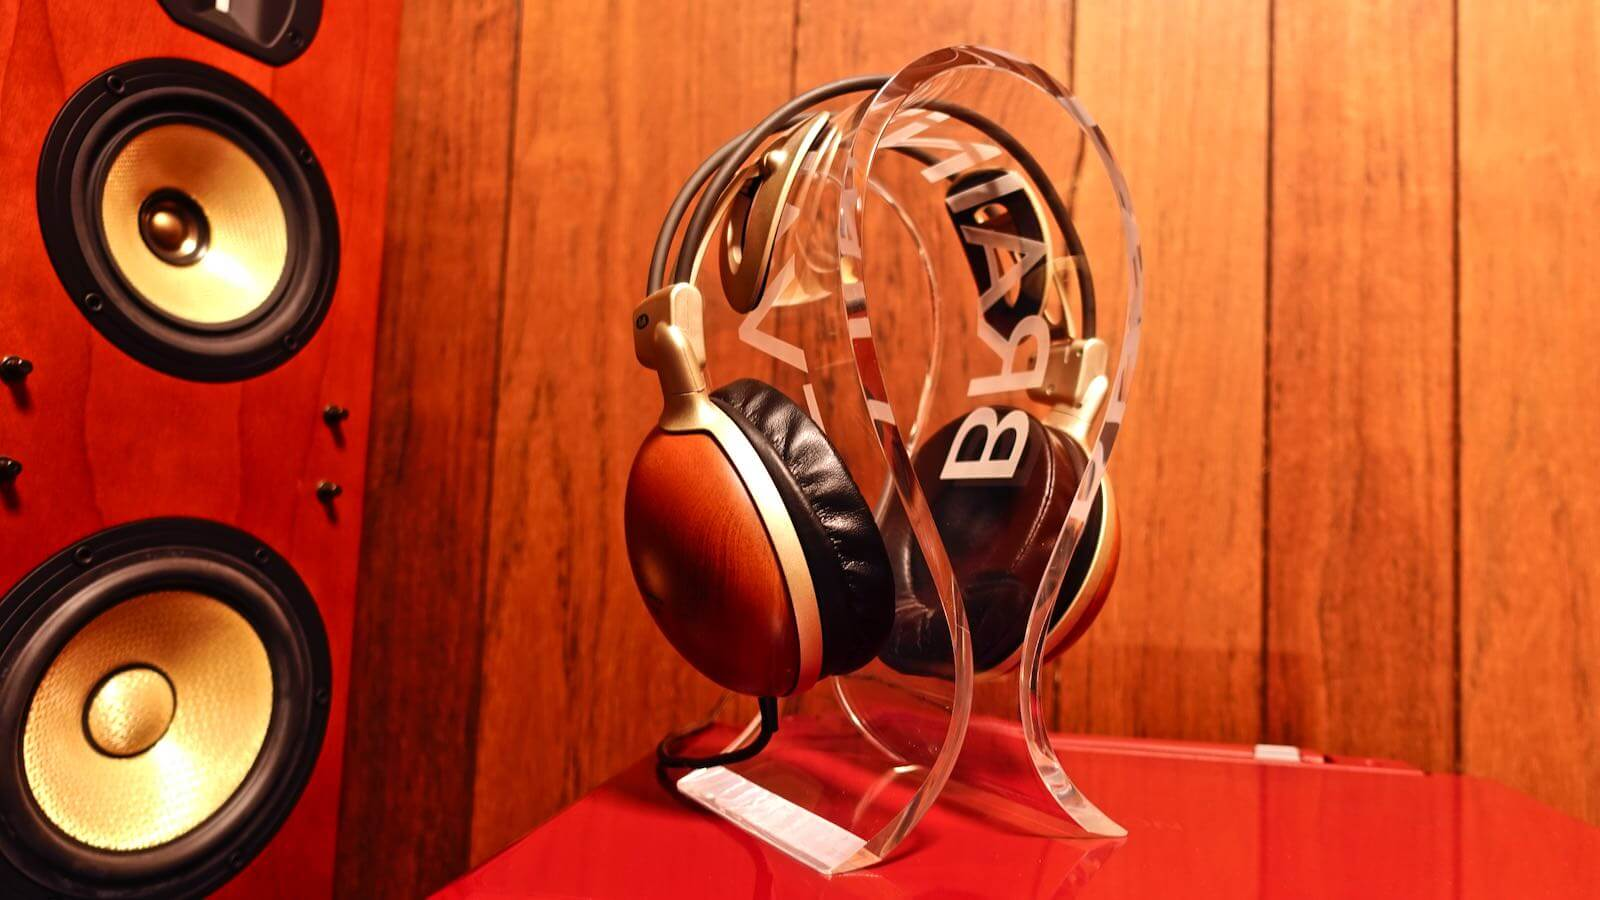 0080 OMEGA type headphone stand BRAINWAVZ review 07